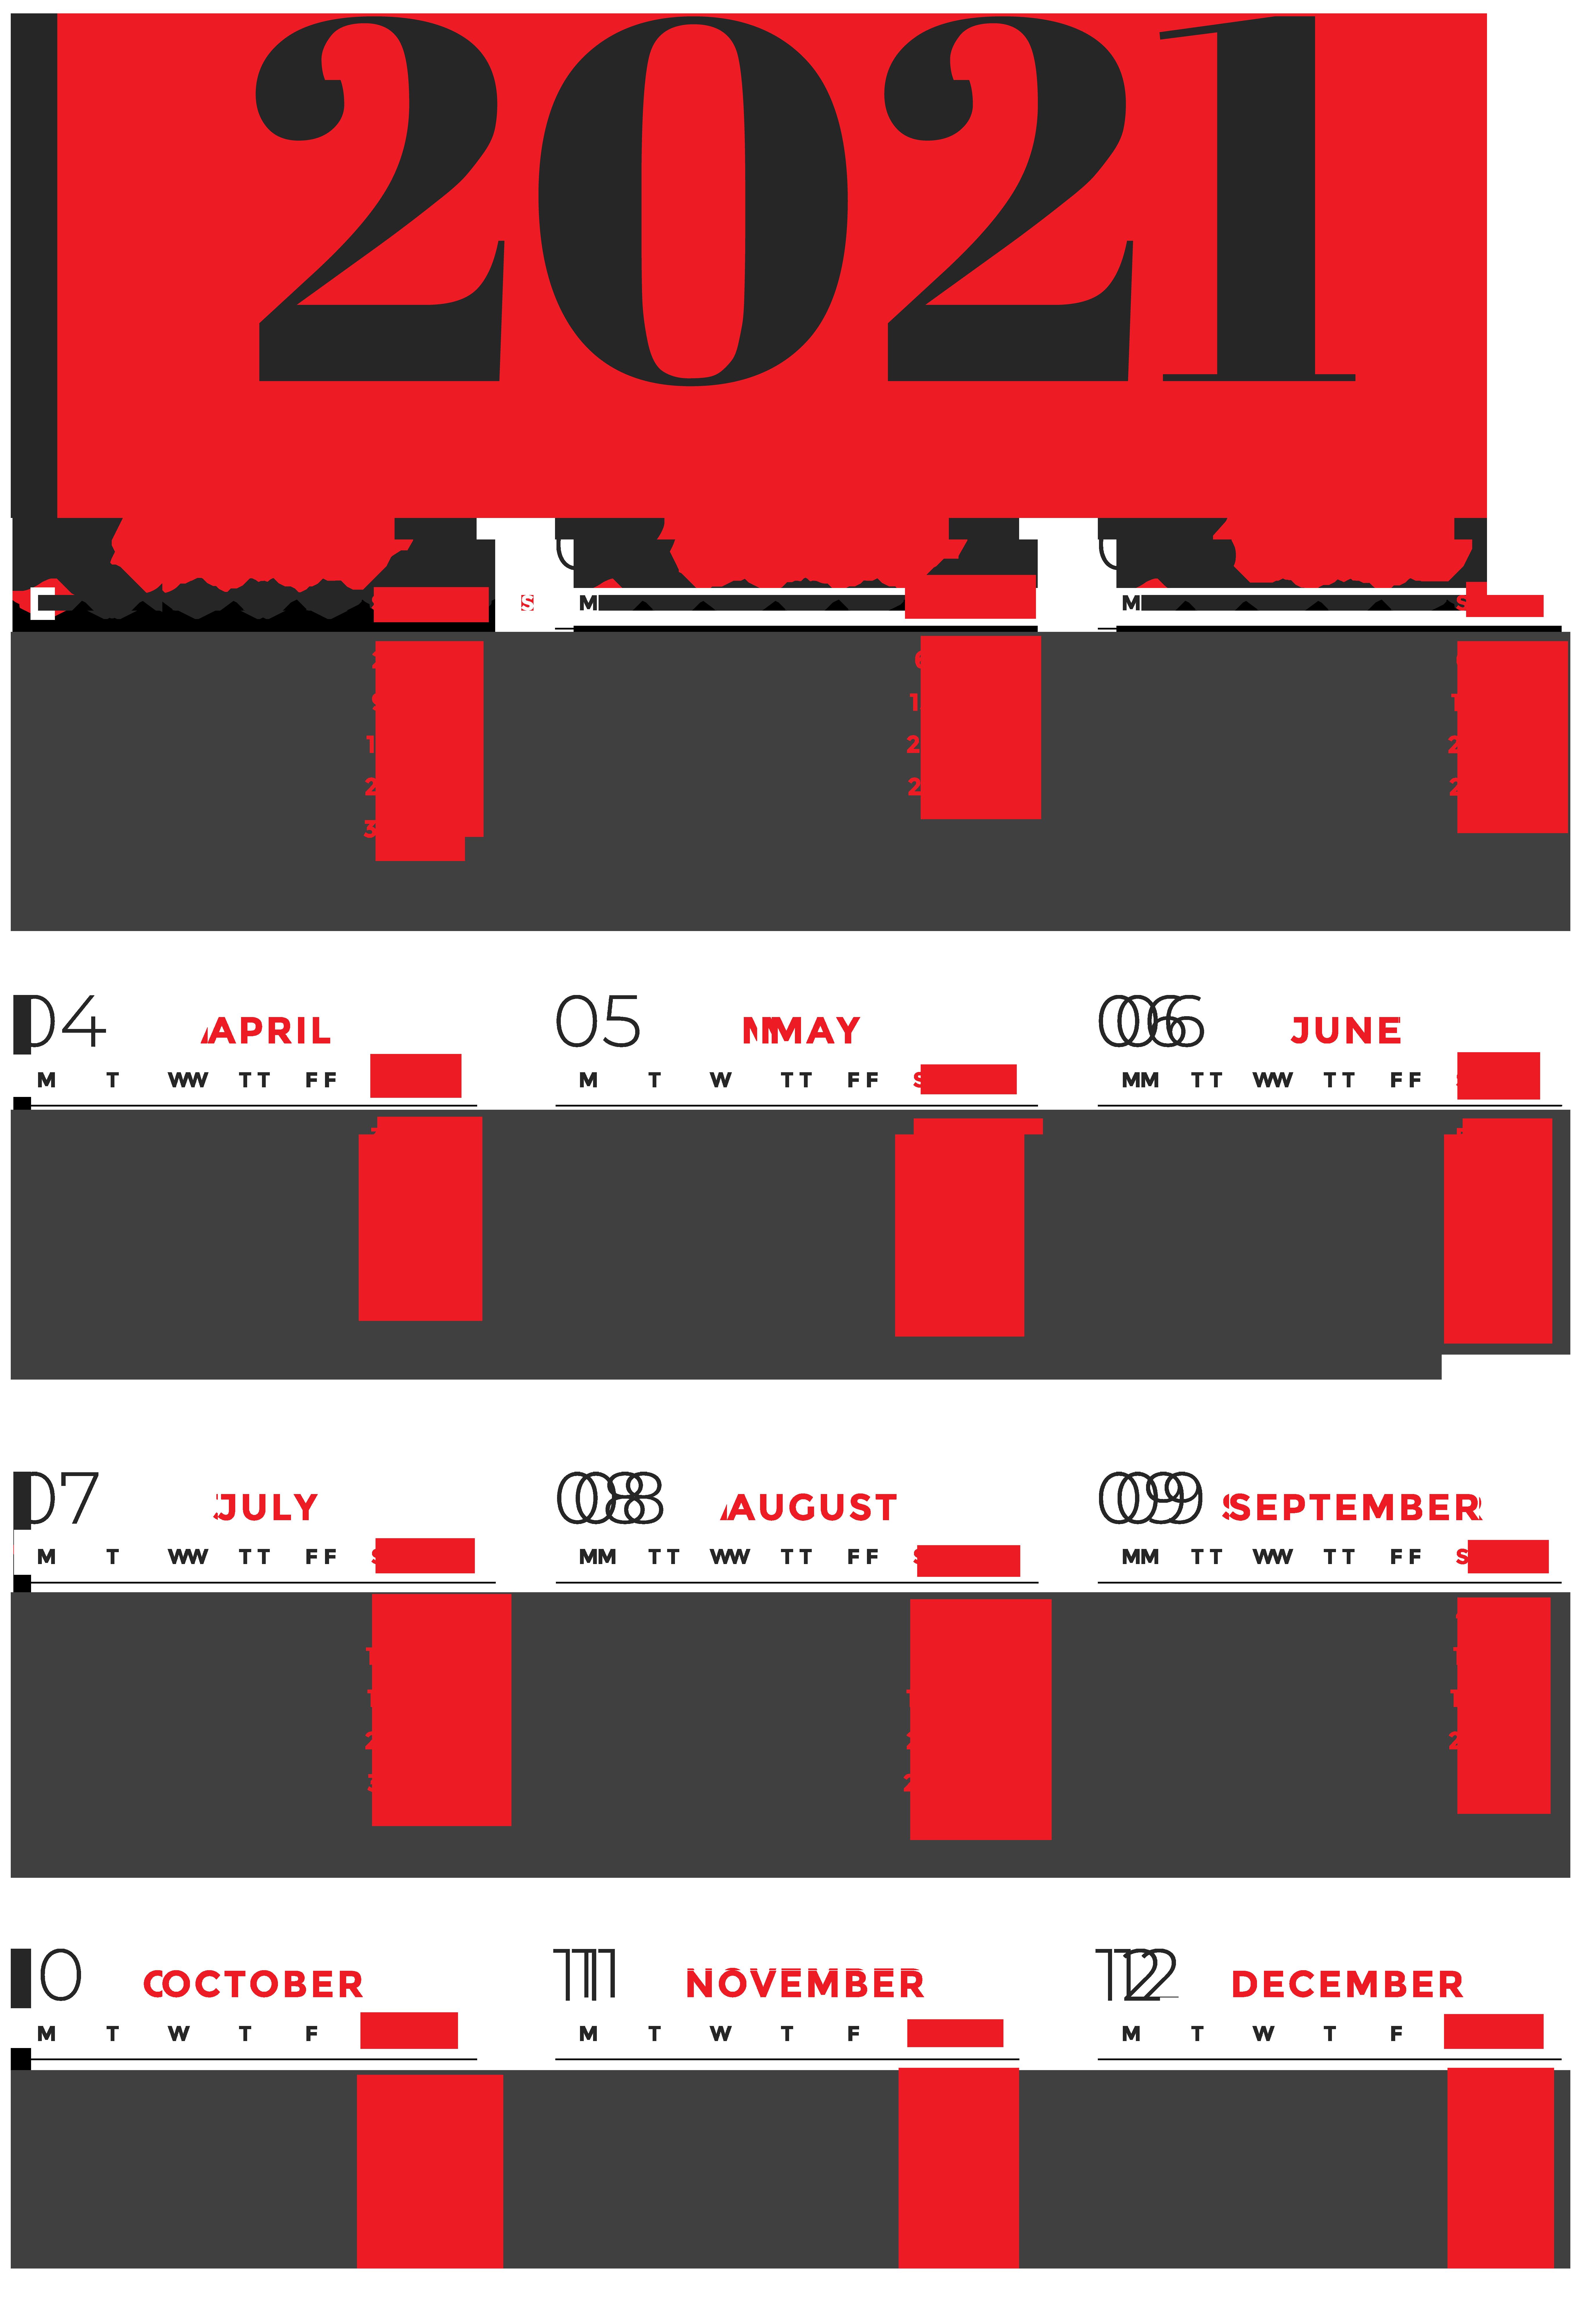 Download Kalender 2021 Hd Aesthetic : Kalender 2021 ...